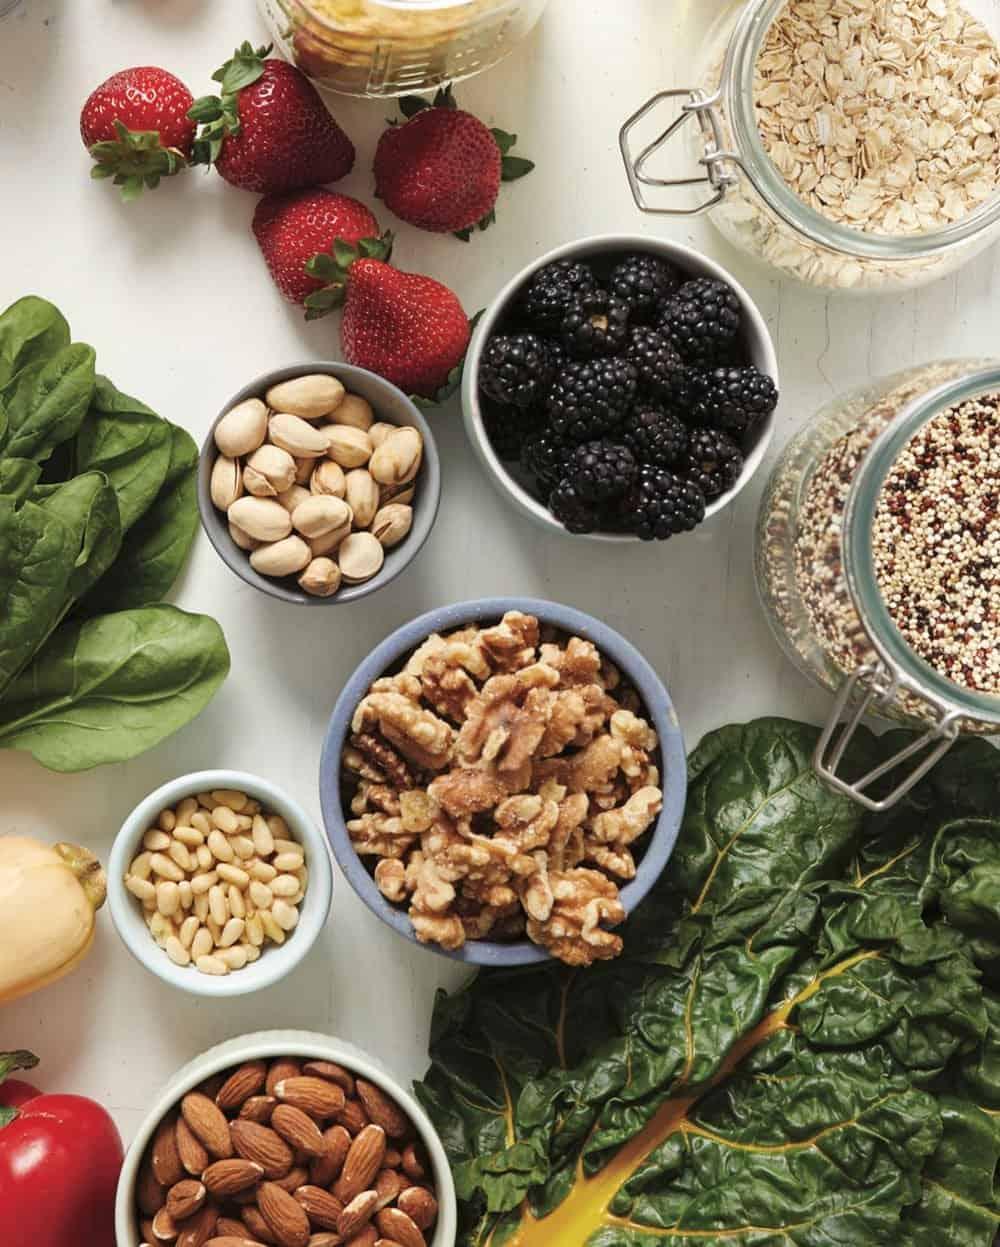 Overhead shot of bulk oats, quinoa, greens, nuts, and leafy greens.